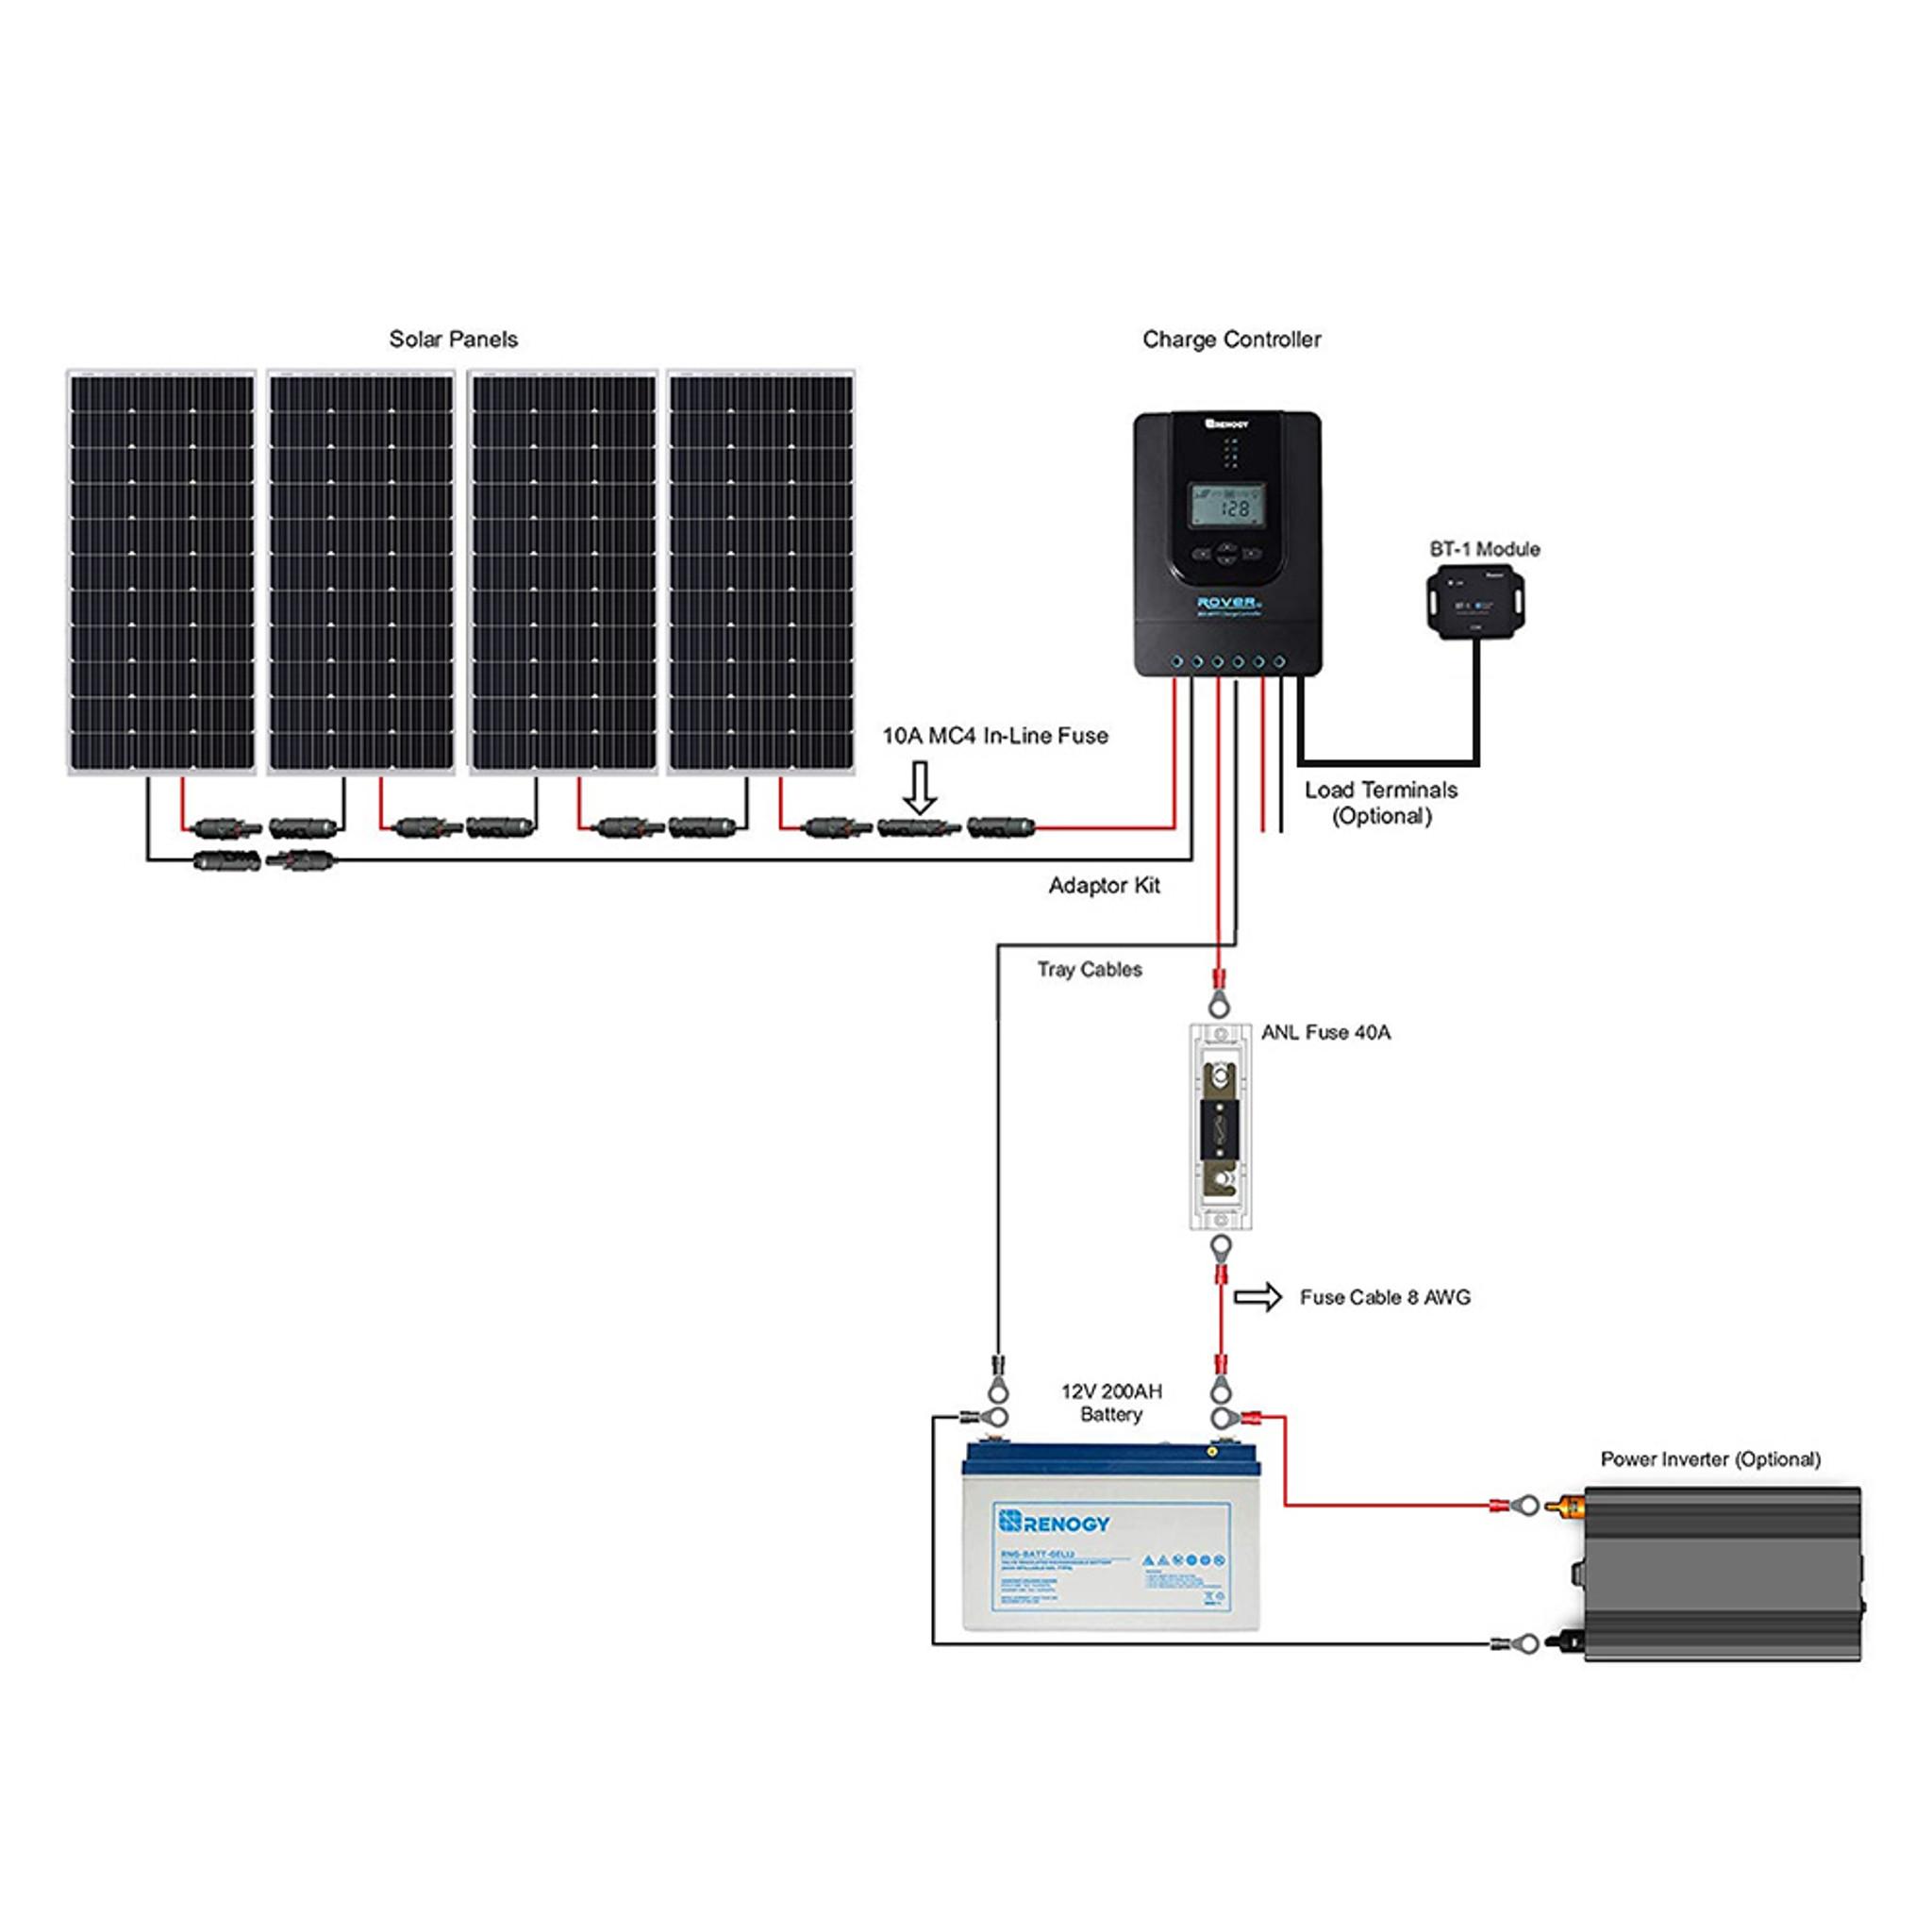 Diagram 240 Volt Panel Wiring Diagram Full Version Hd Quality Wiring Diagram Diagramdennyj Kazantip Fr